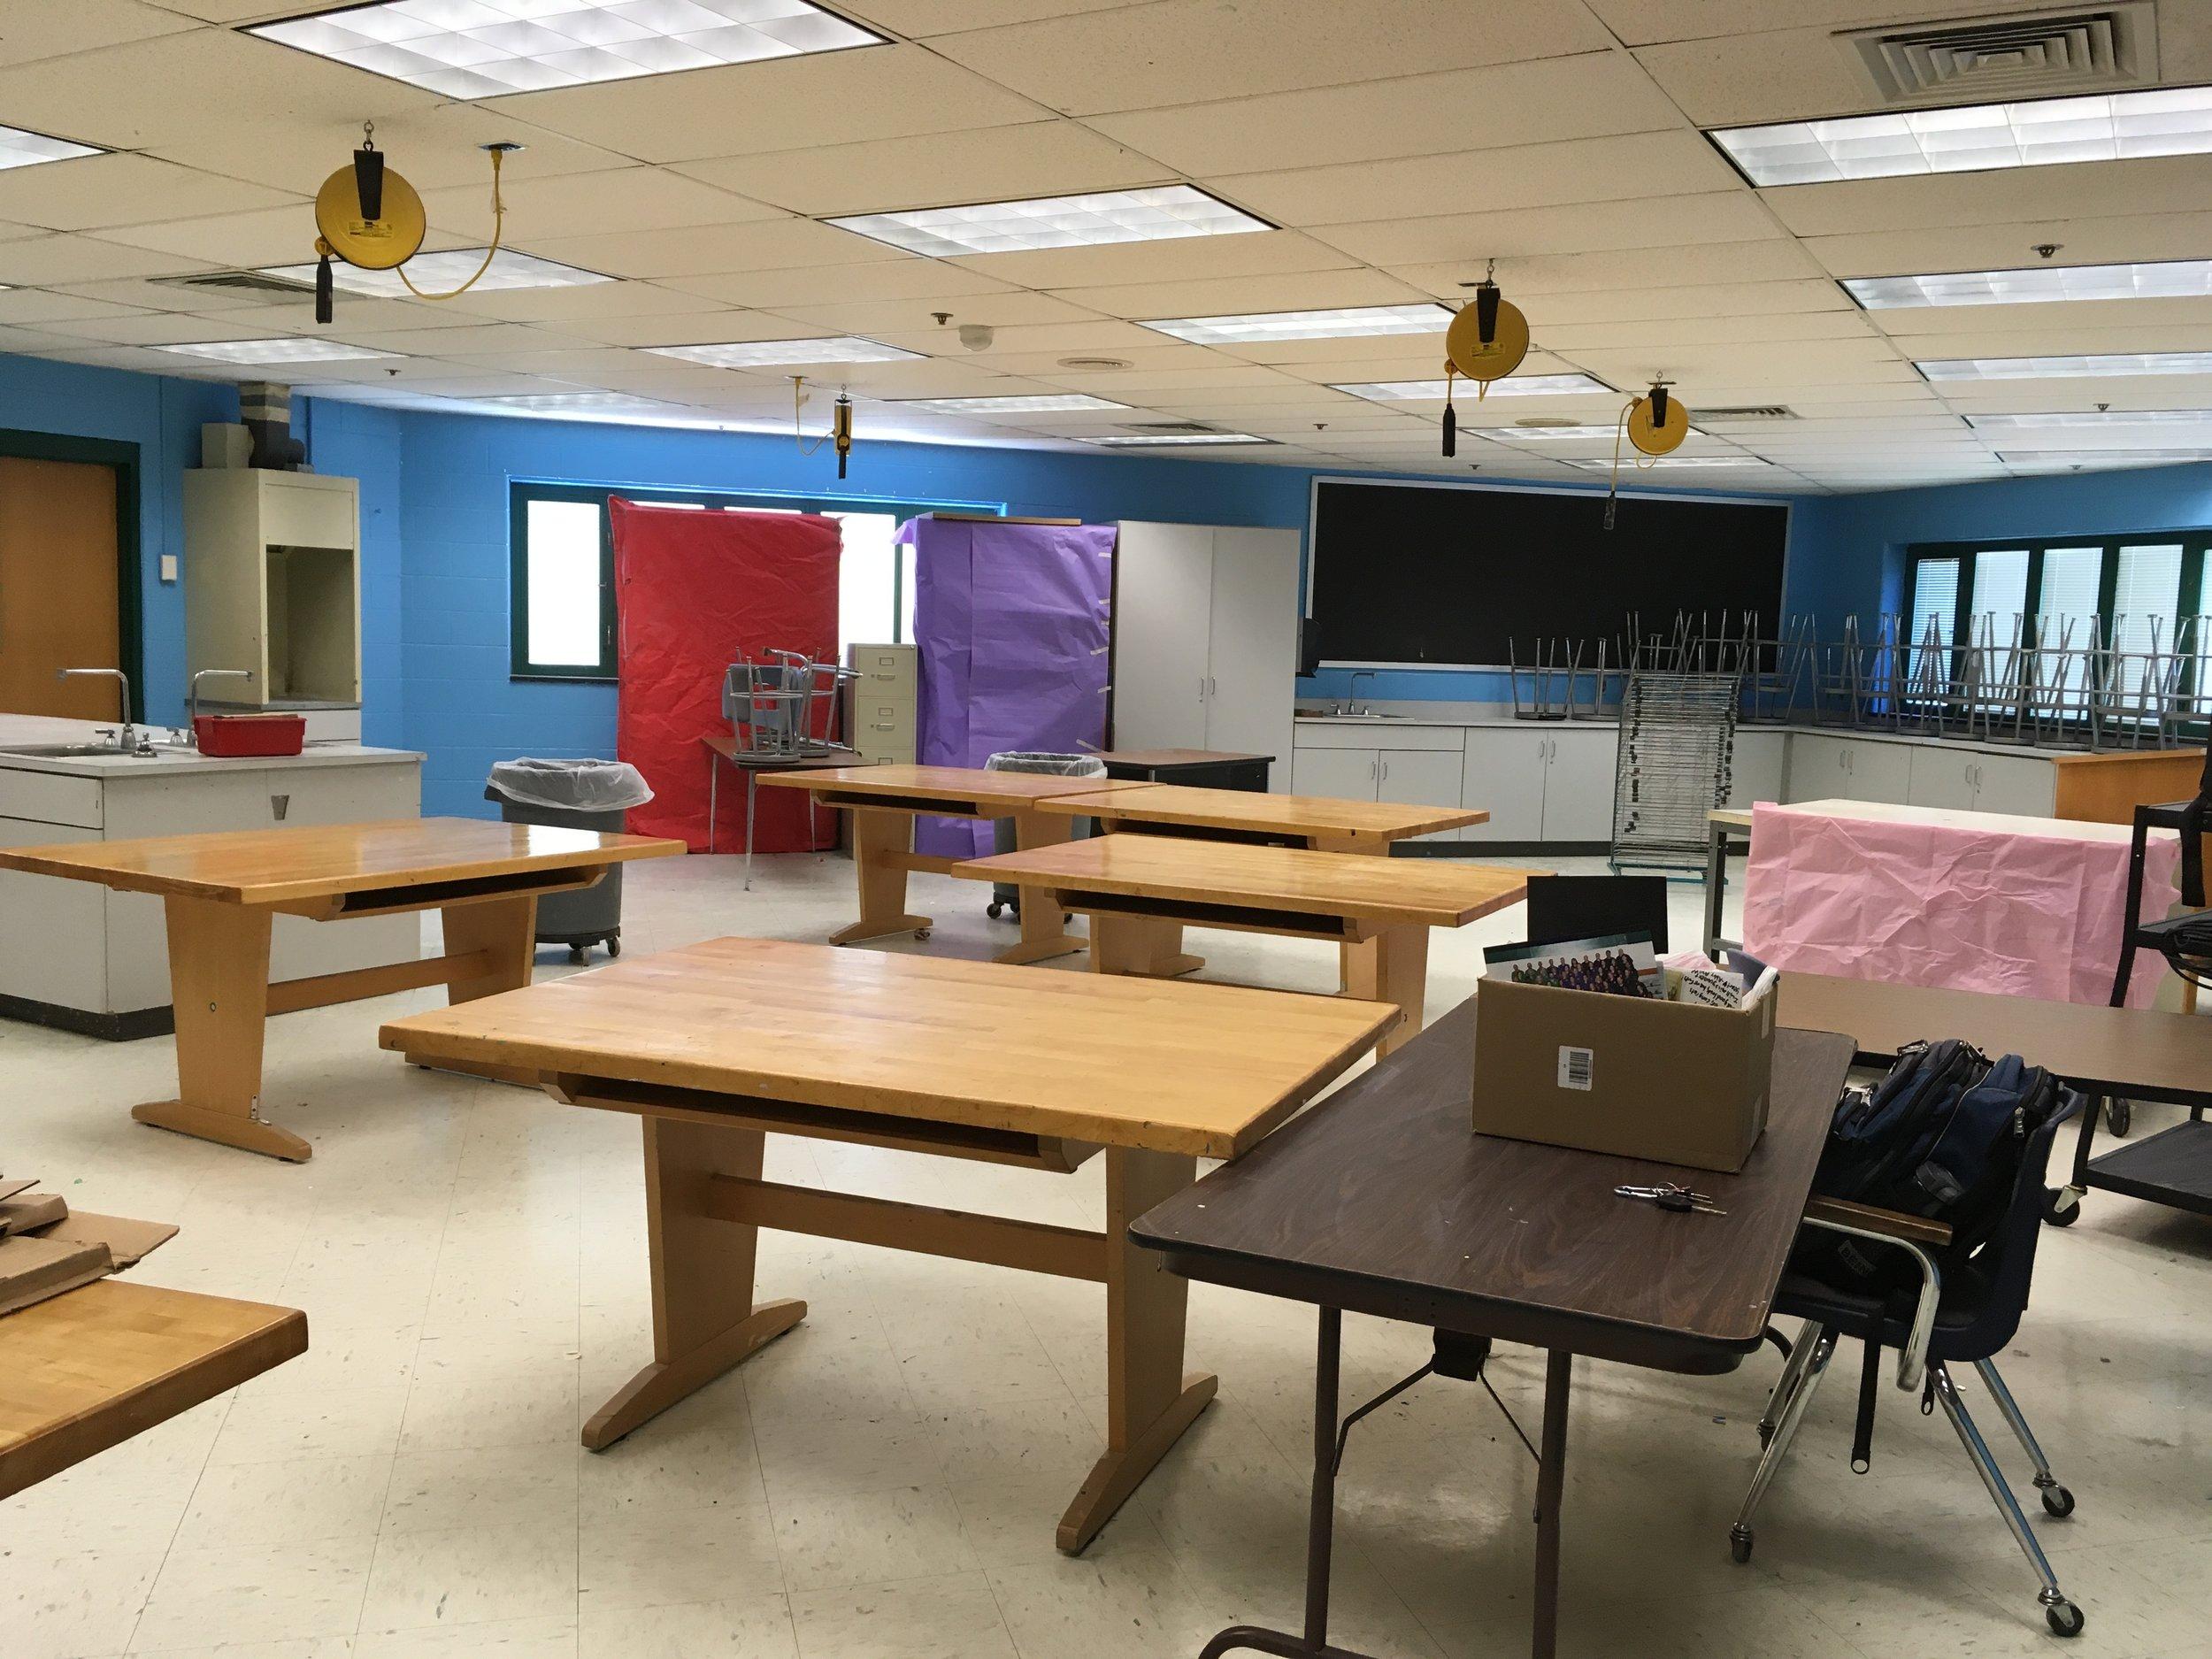 My classroom on my last day in Howard County. Bittersweet.